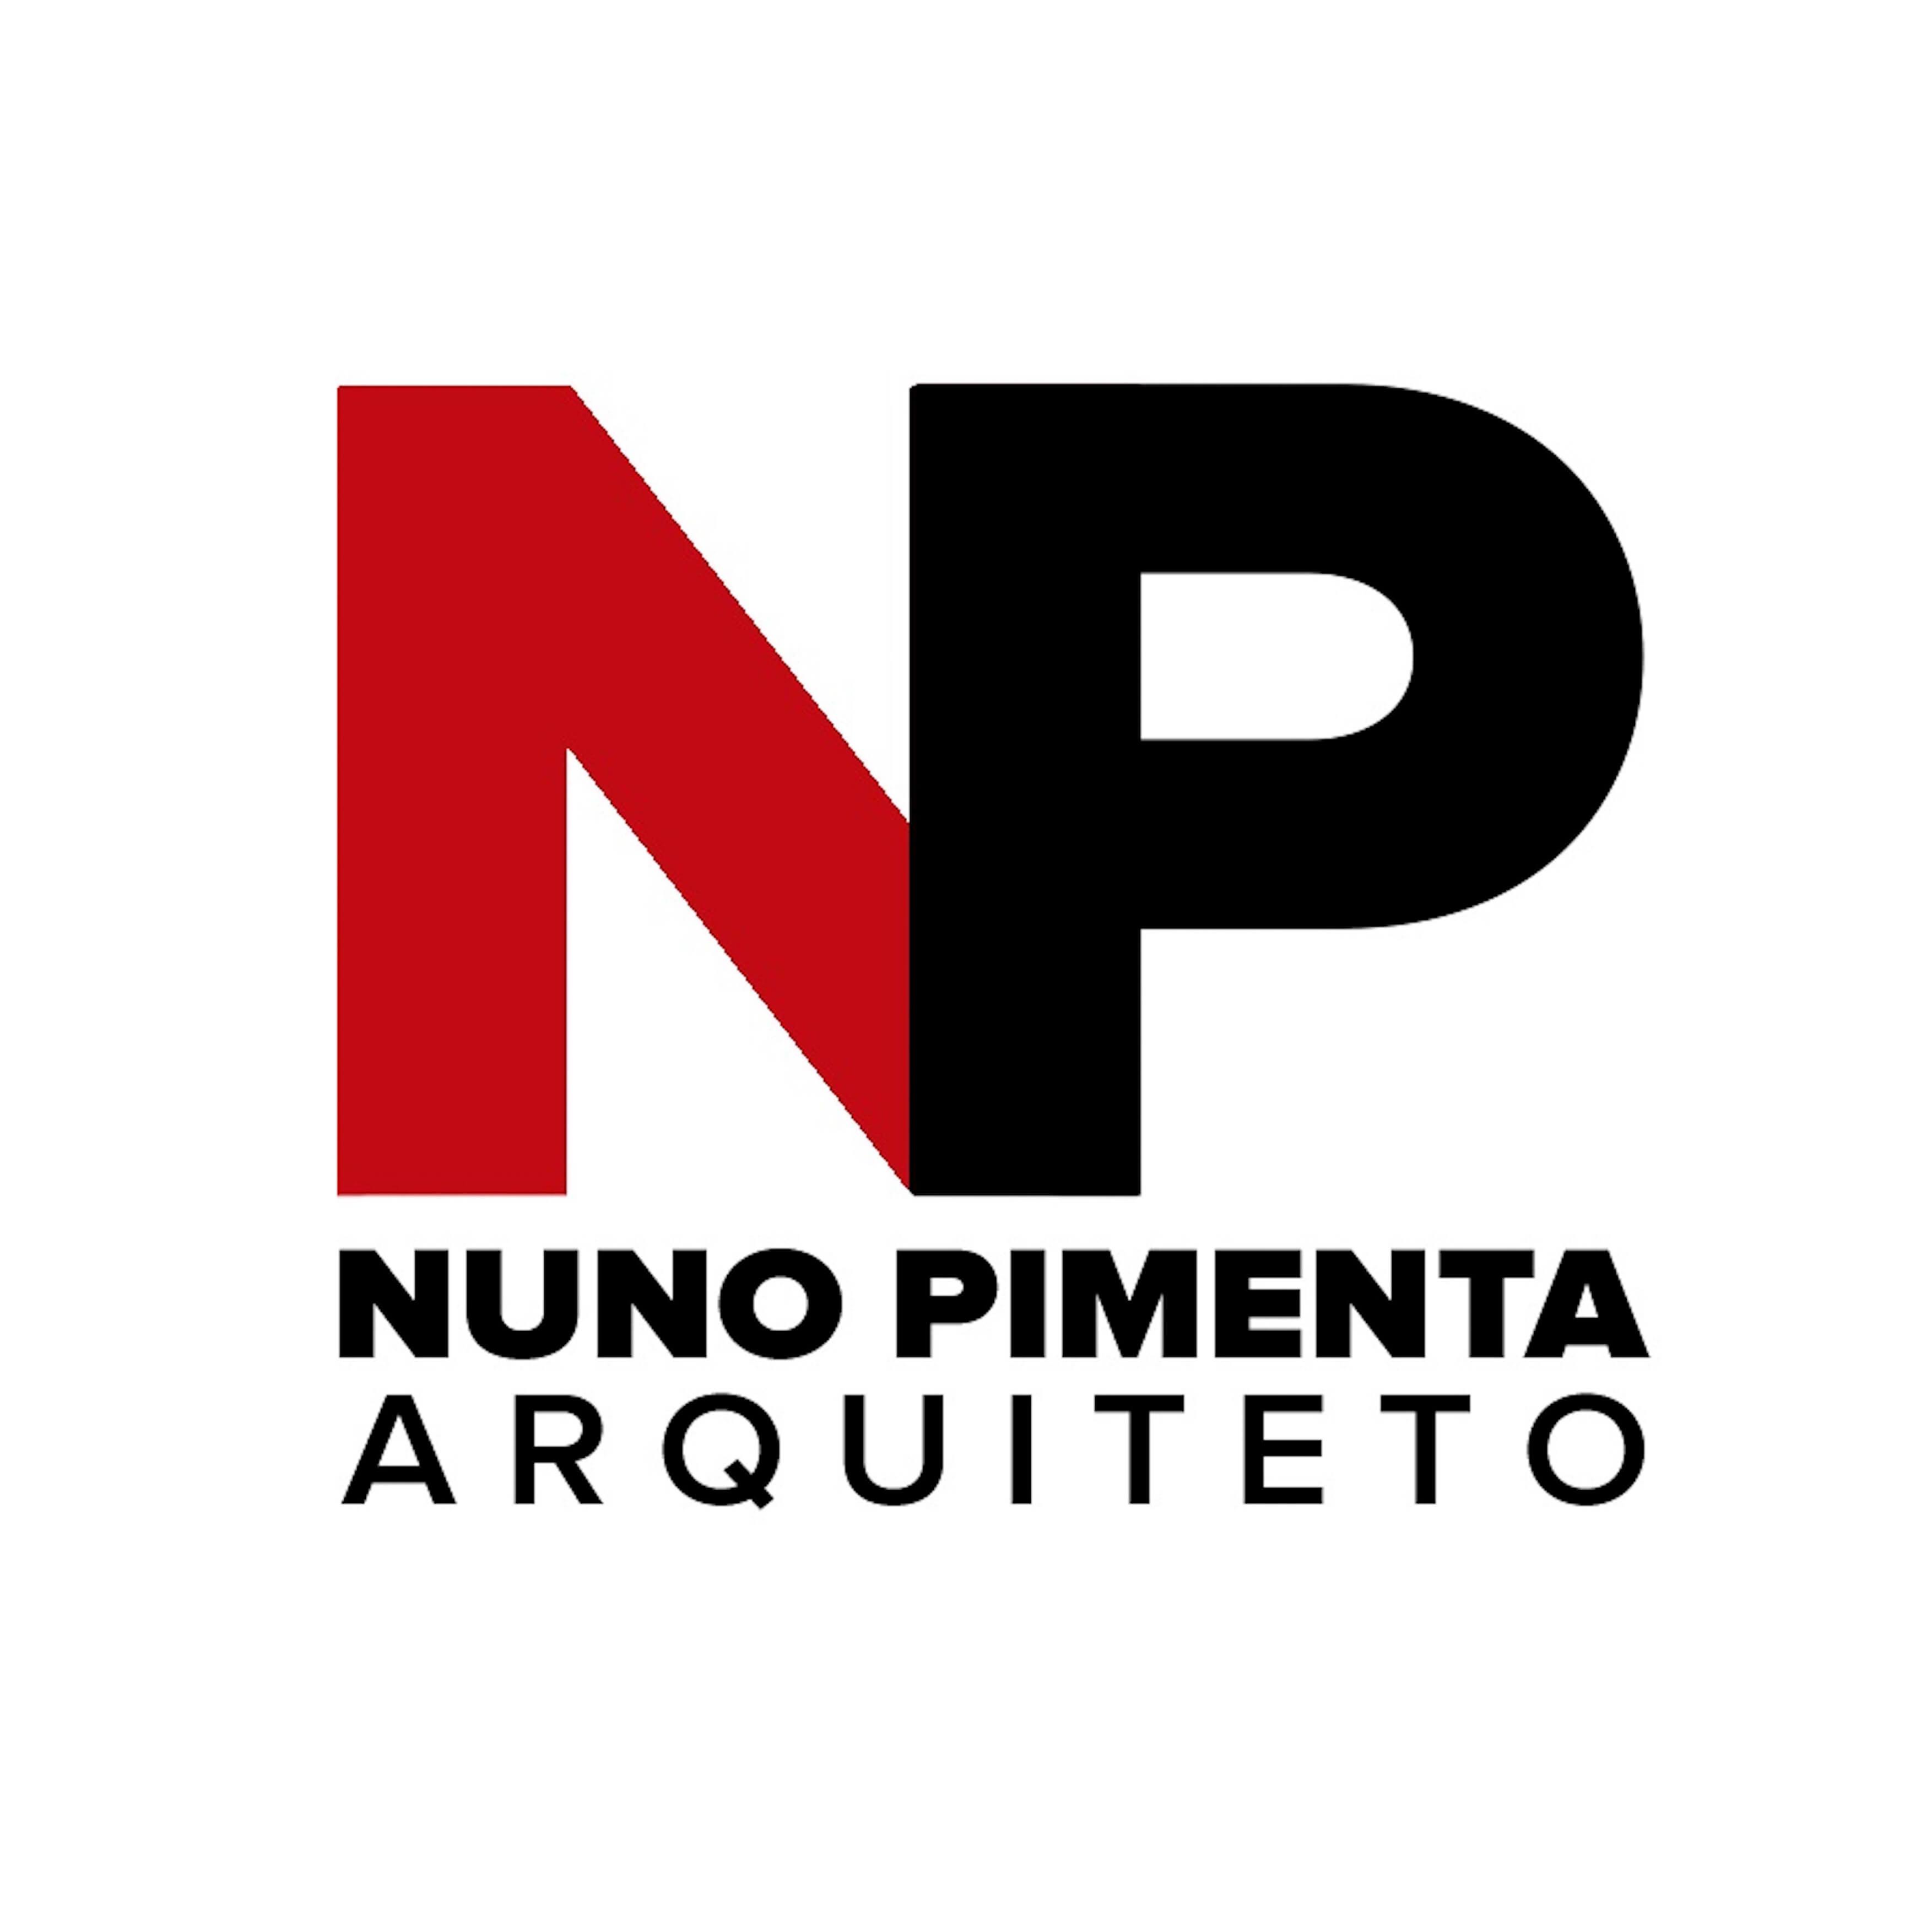 Nuno Pimenta – Arquiteto